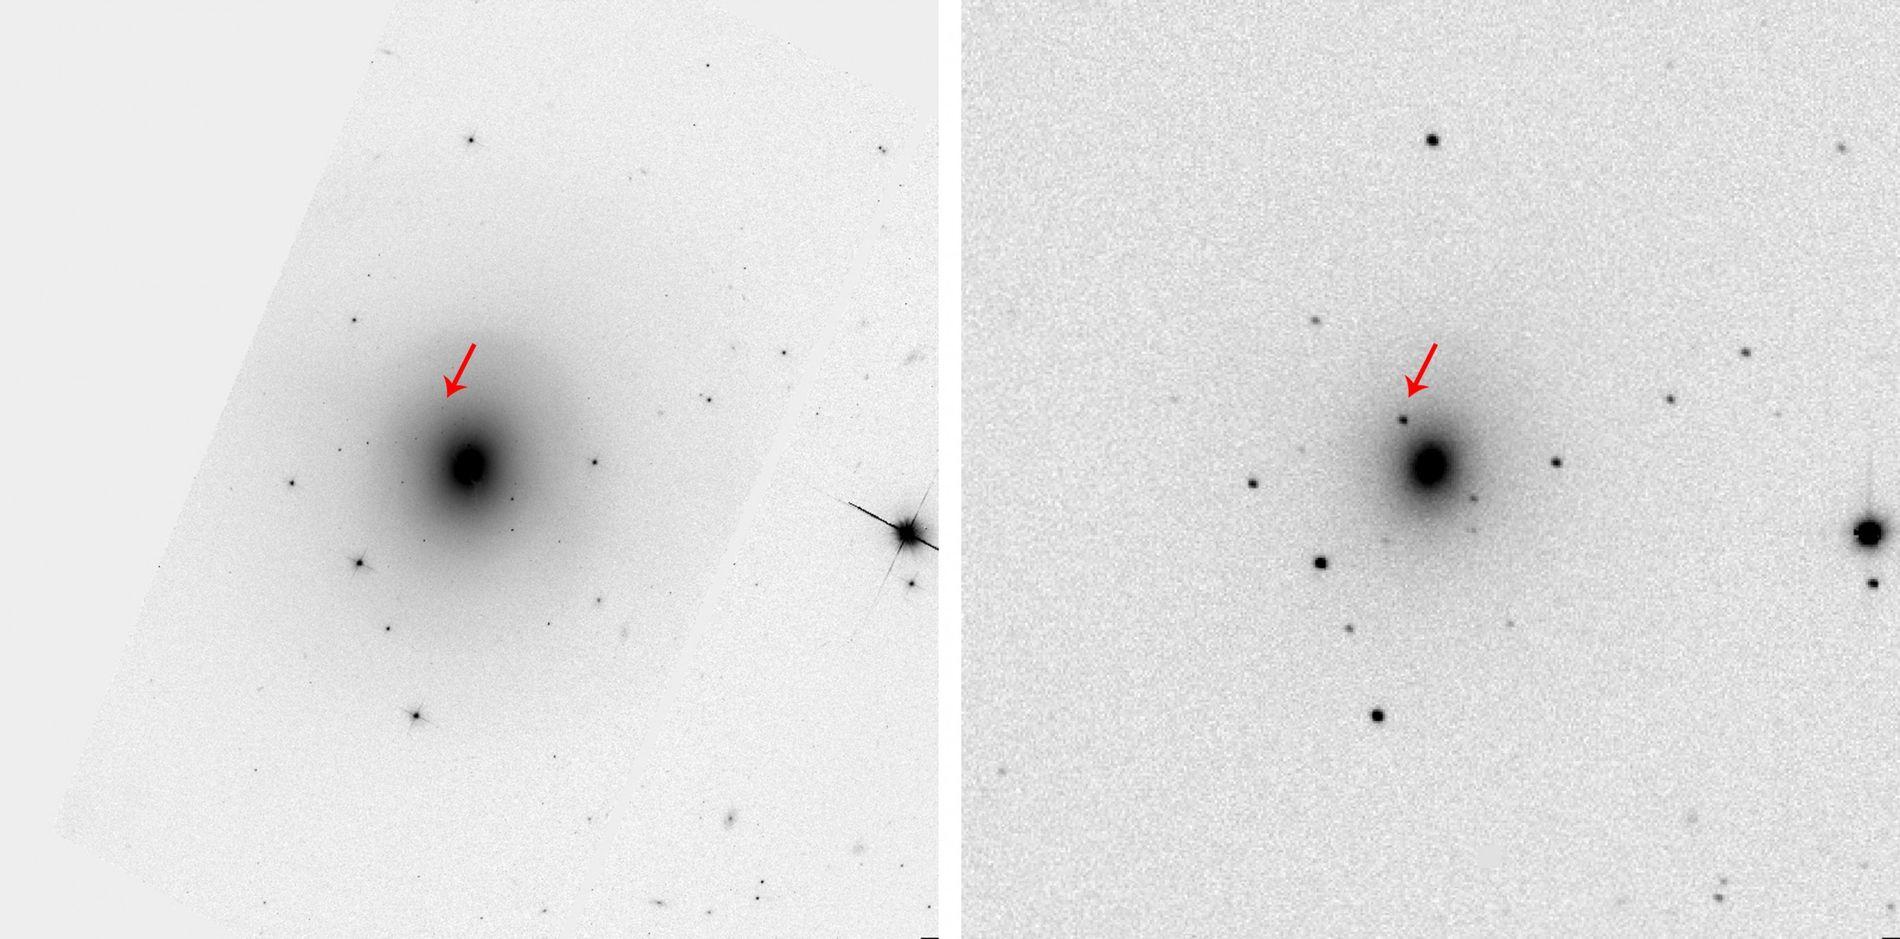 Imagem do telescópio espacial Hubble Space Telescope (à esquerda) mostra a galáxia oval NGC 4993, como ...